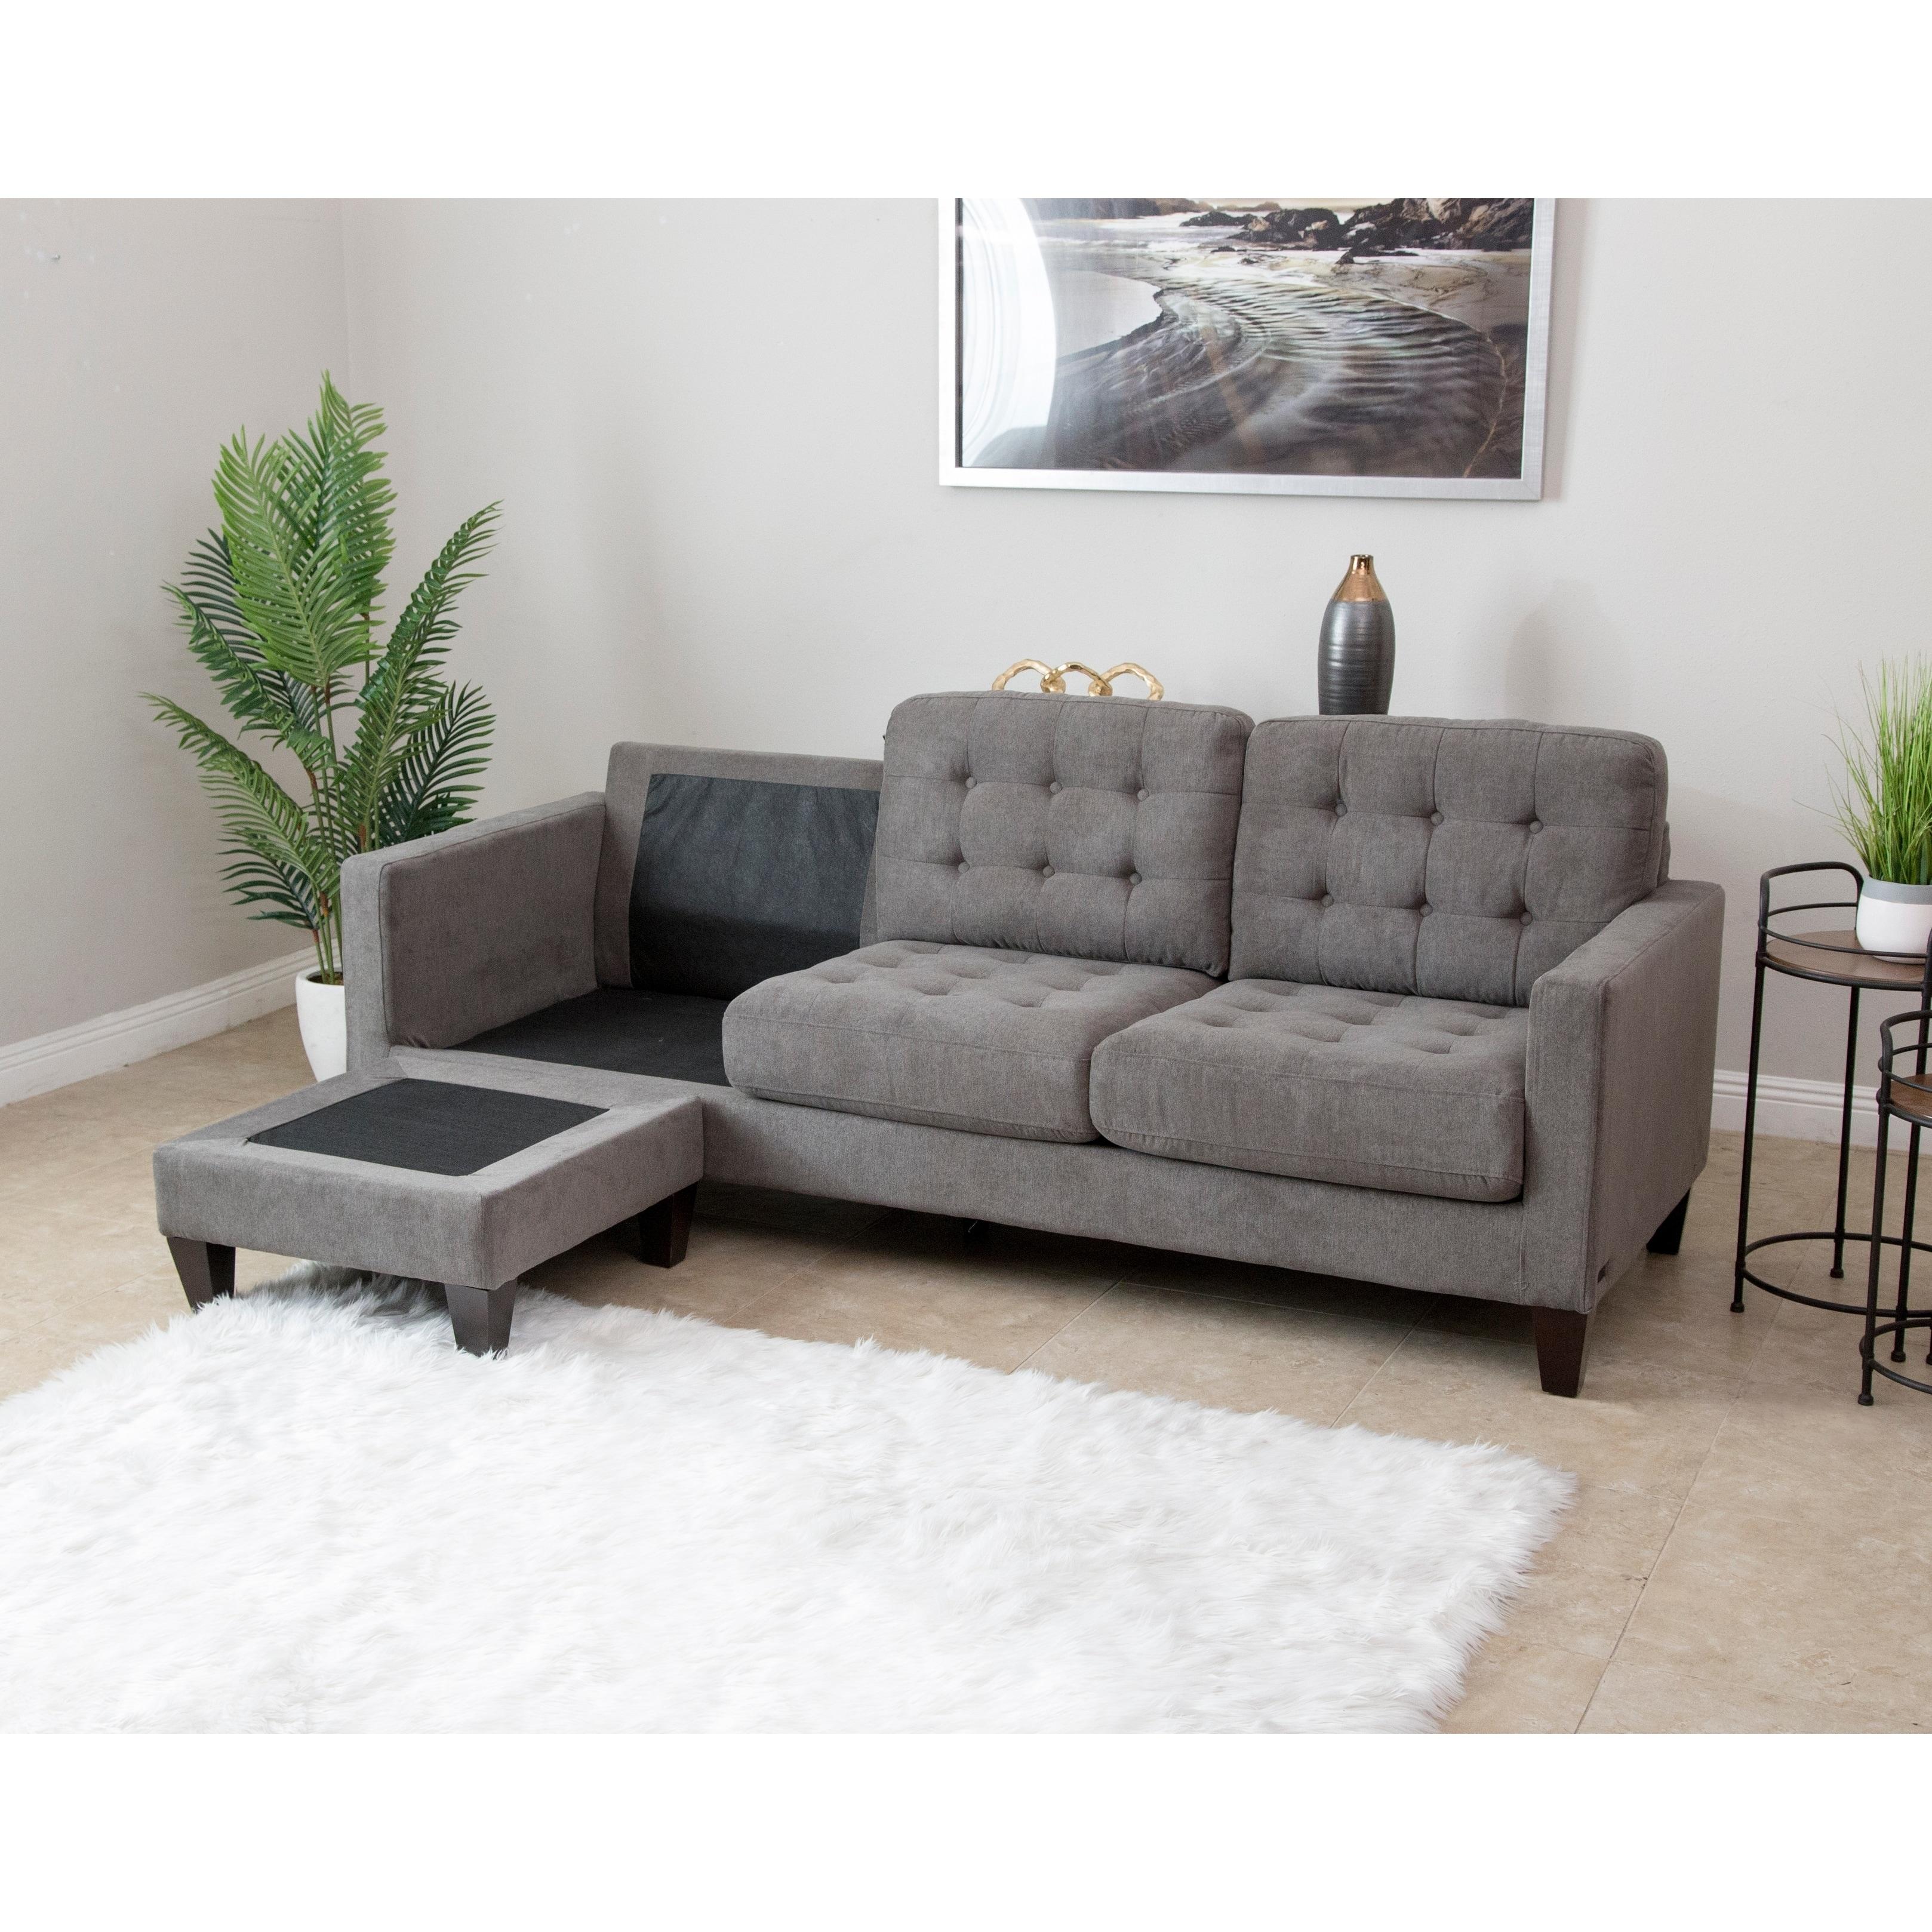 Shop Abbyson Easton Grey Fabric Reversible Sectional Sofa On Sale